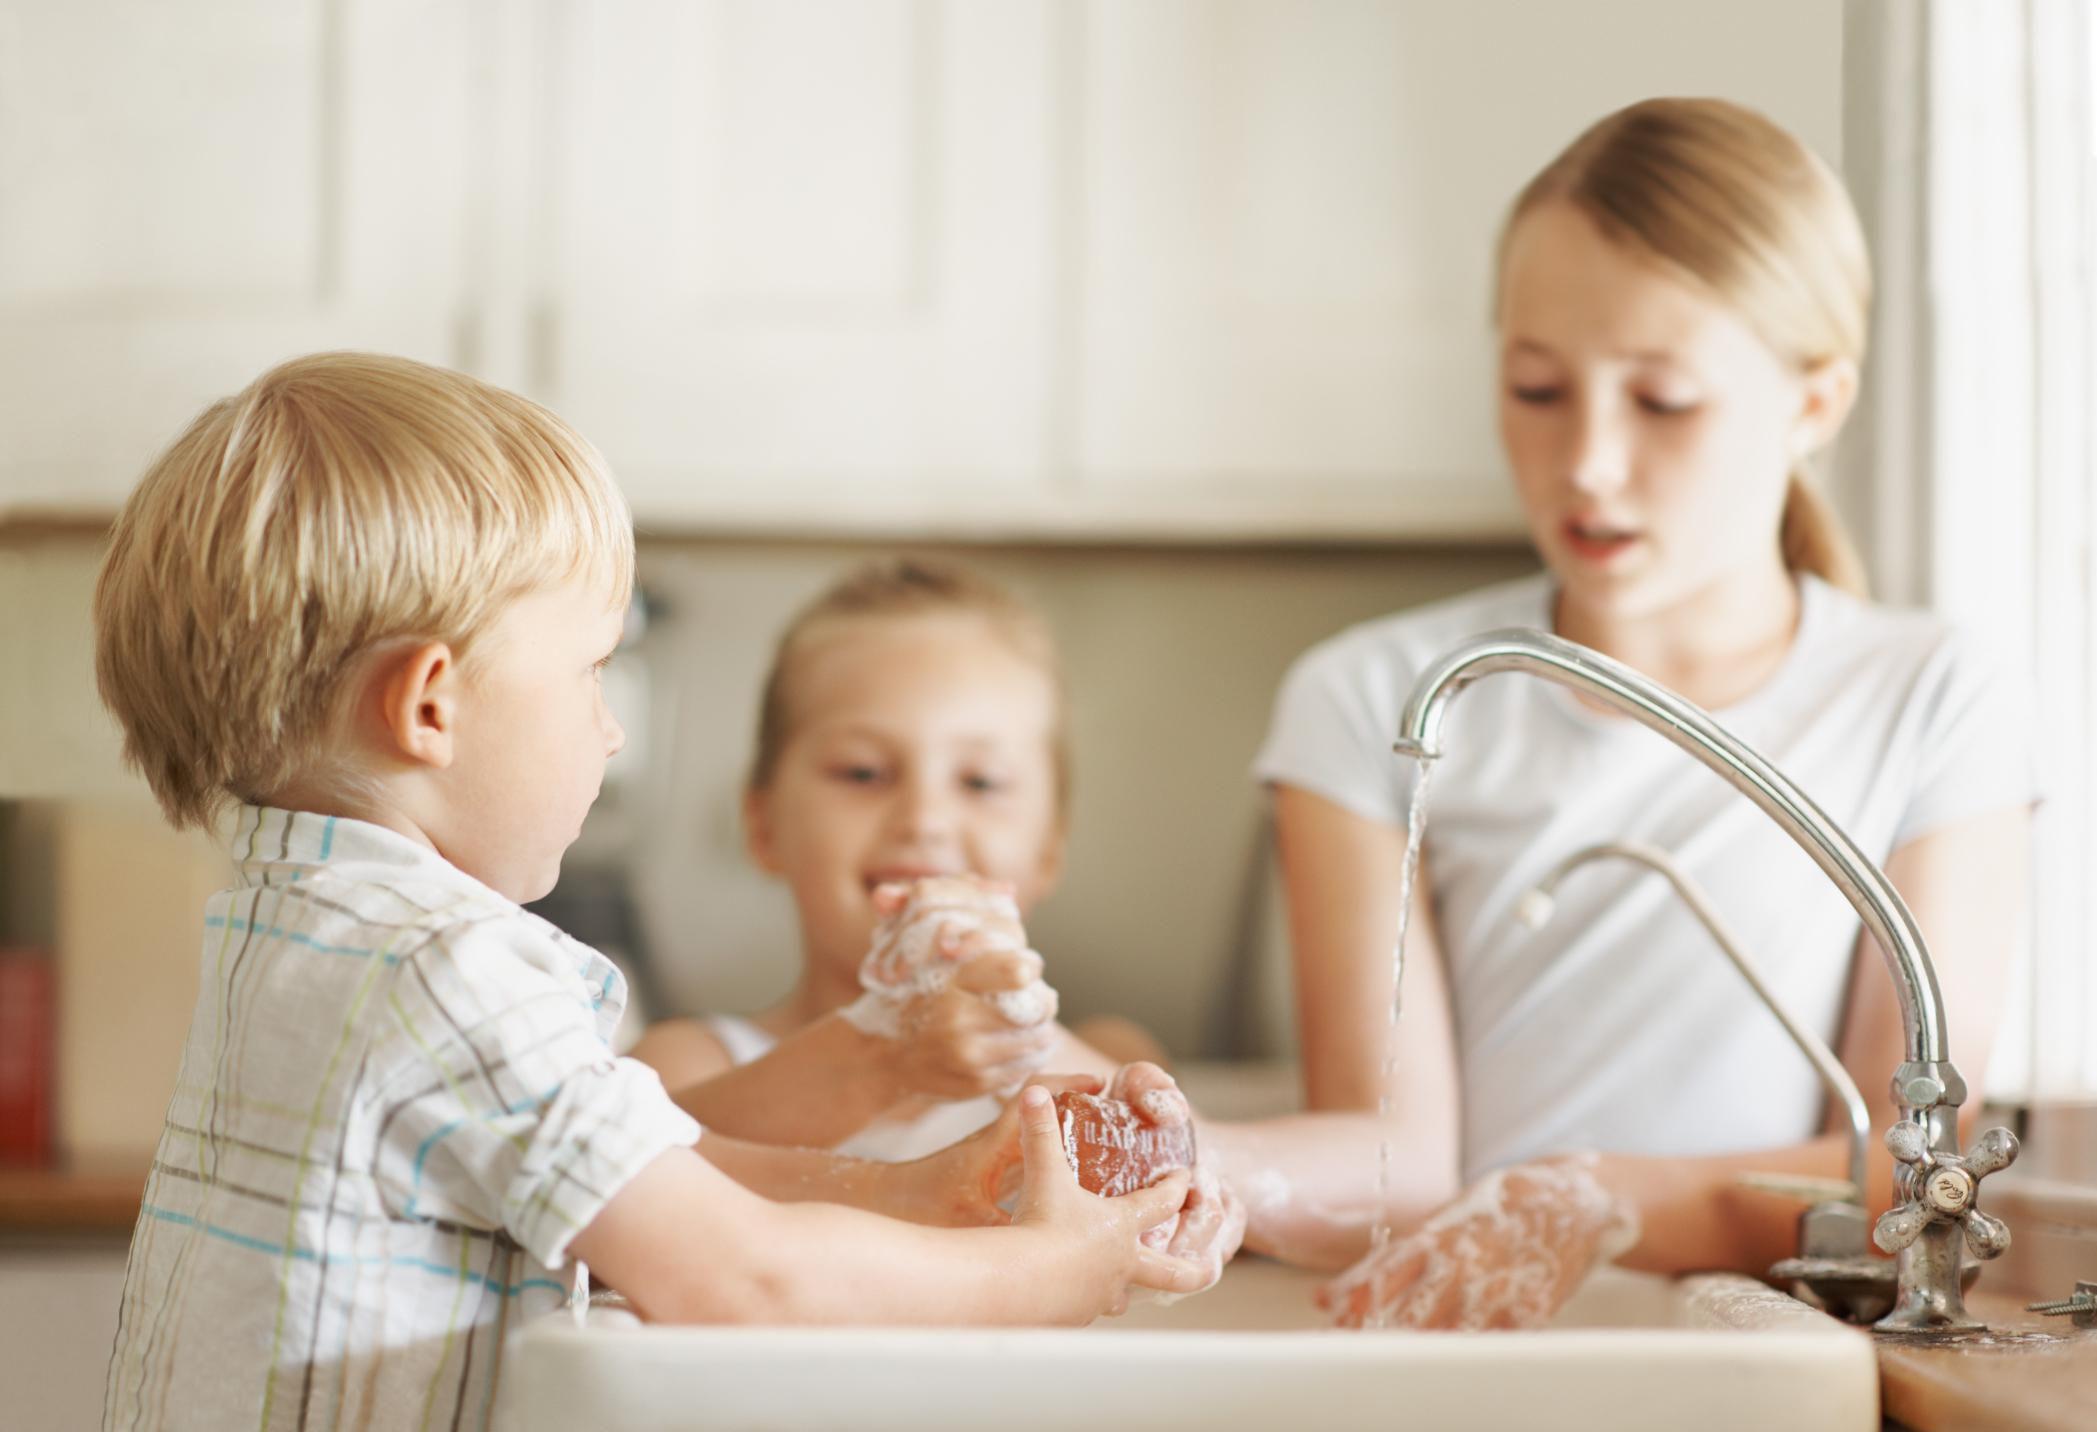 Best Personal Hygiene Habit To Teach Kids